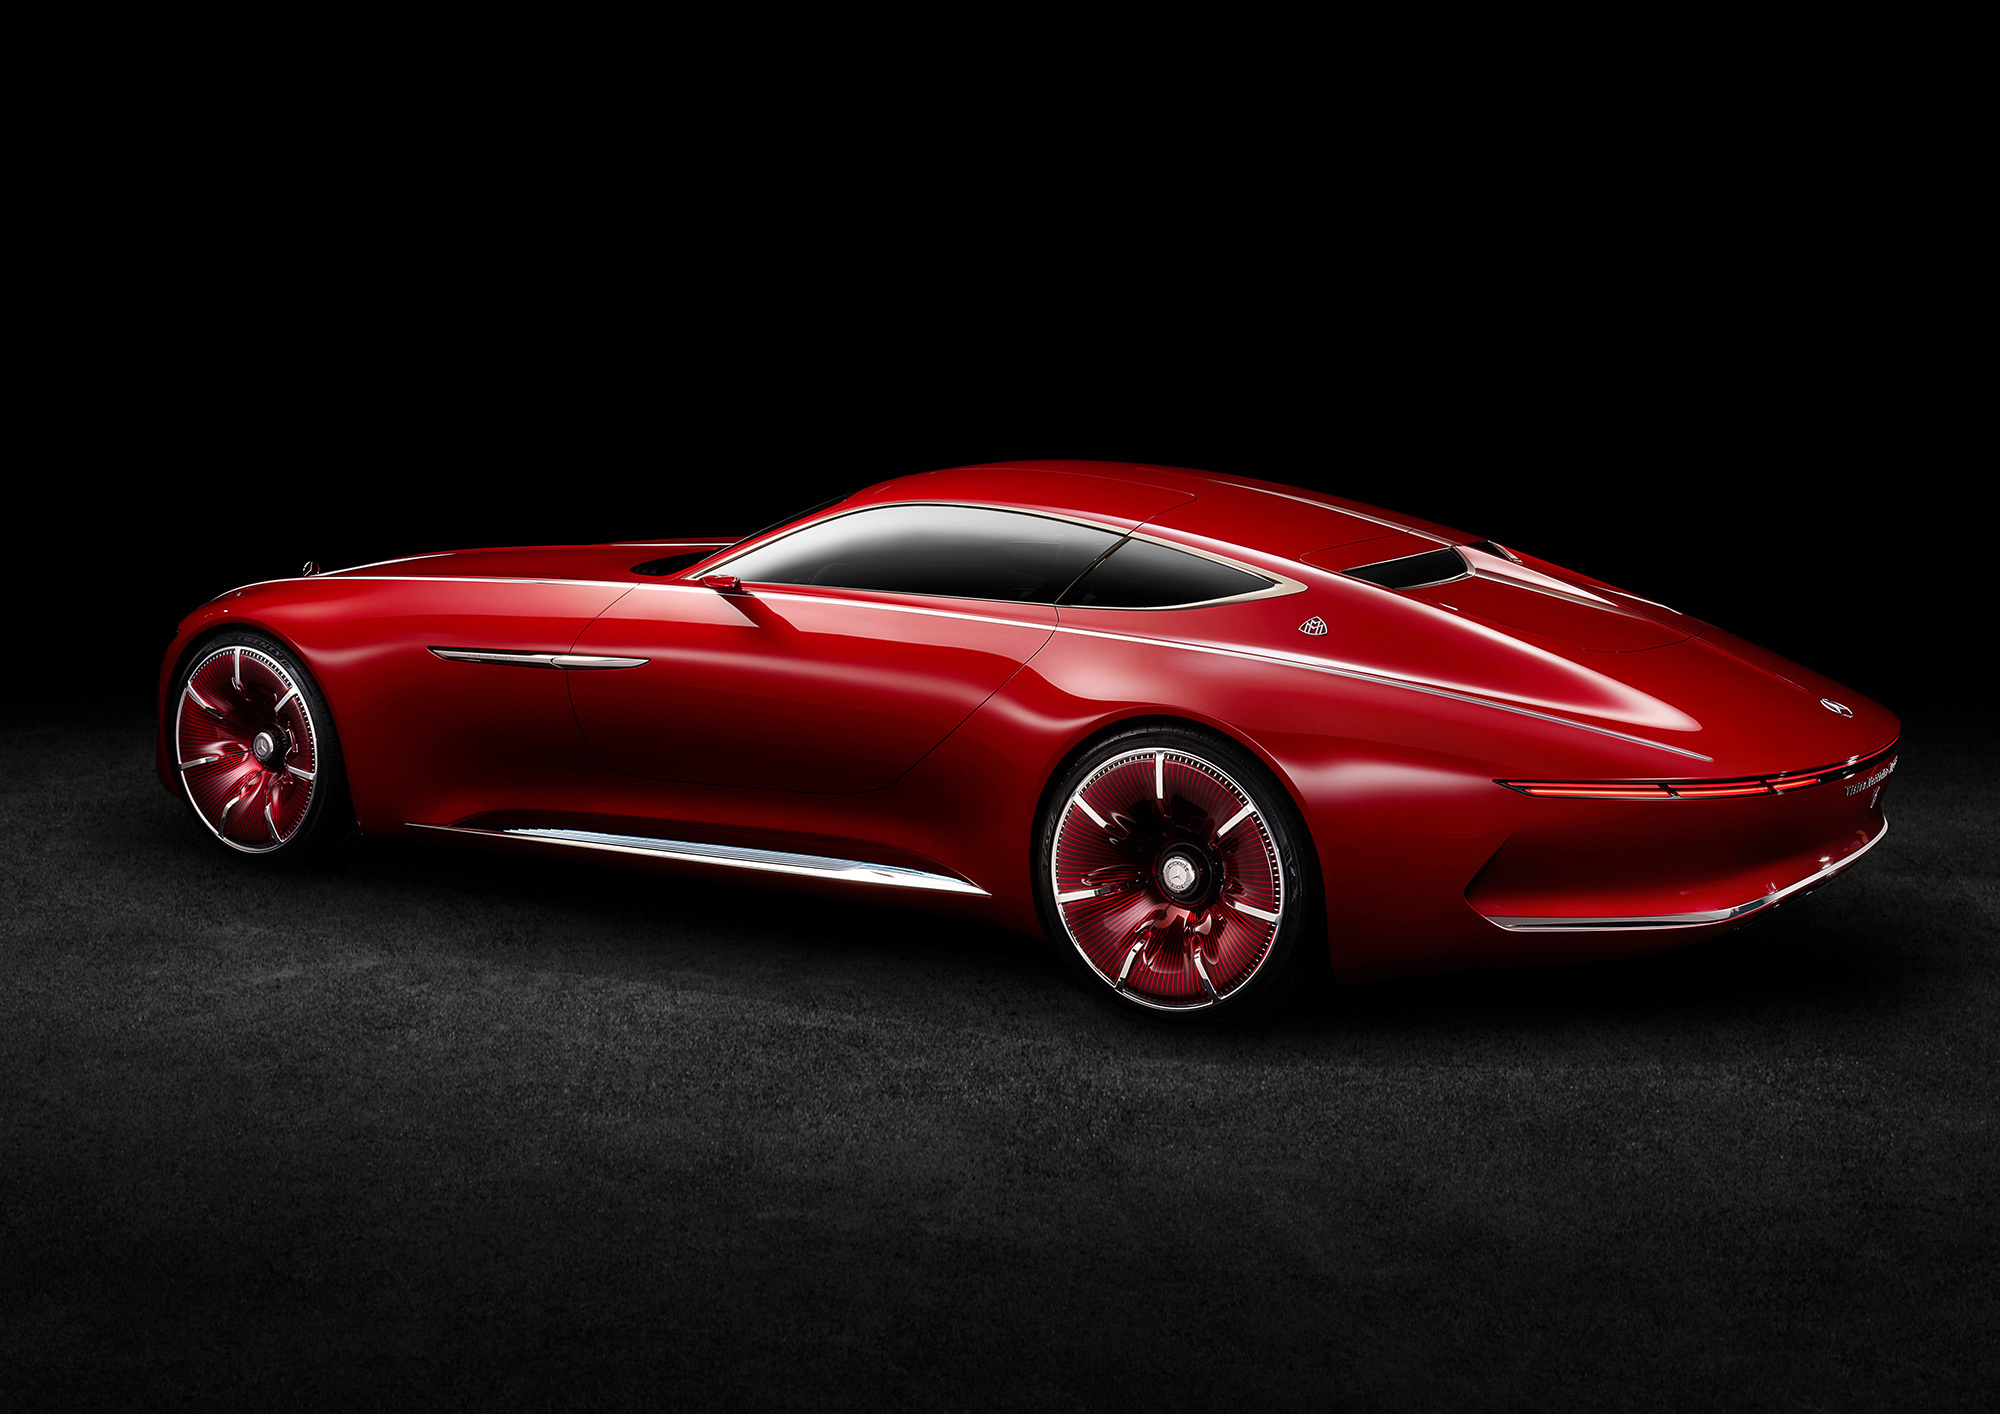 Vision Mercedes Maybach 6 Widescreen